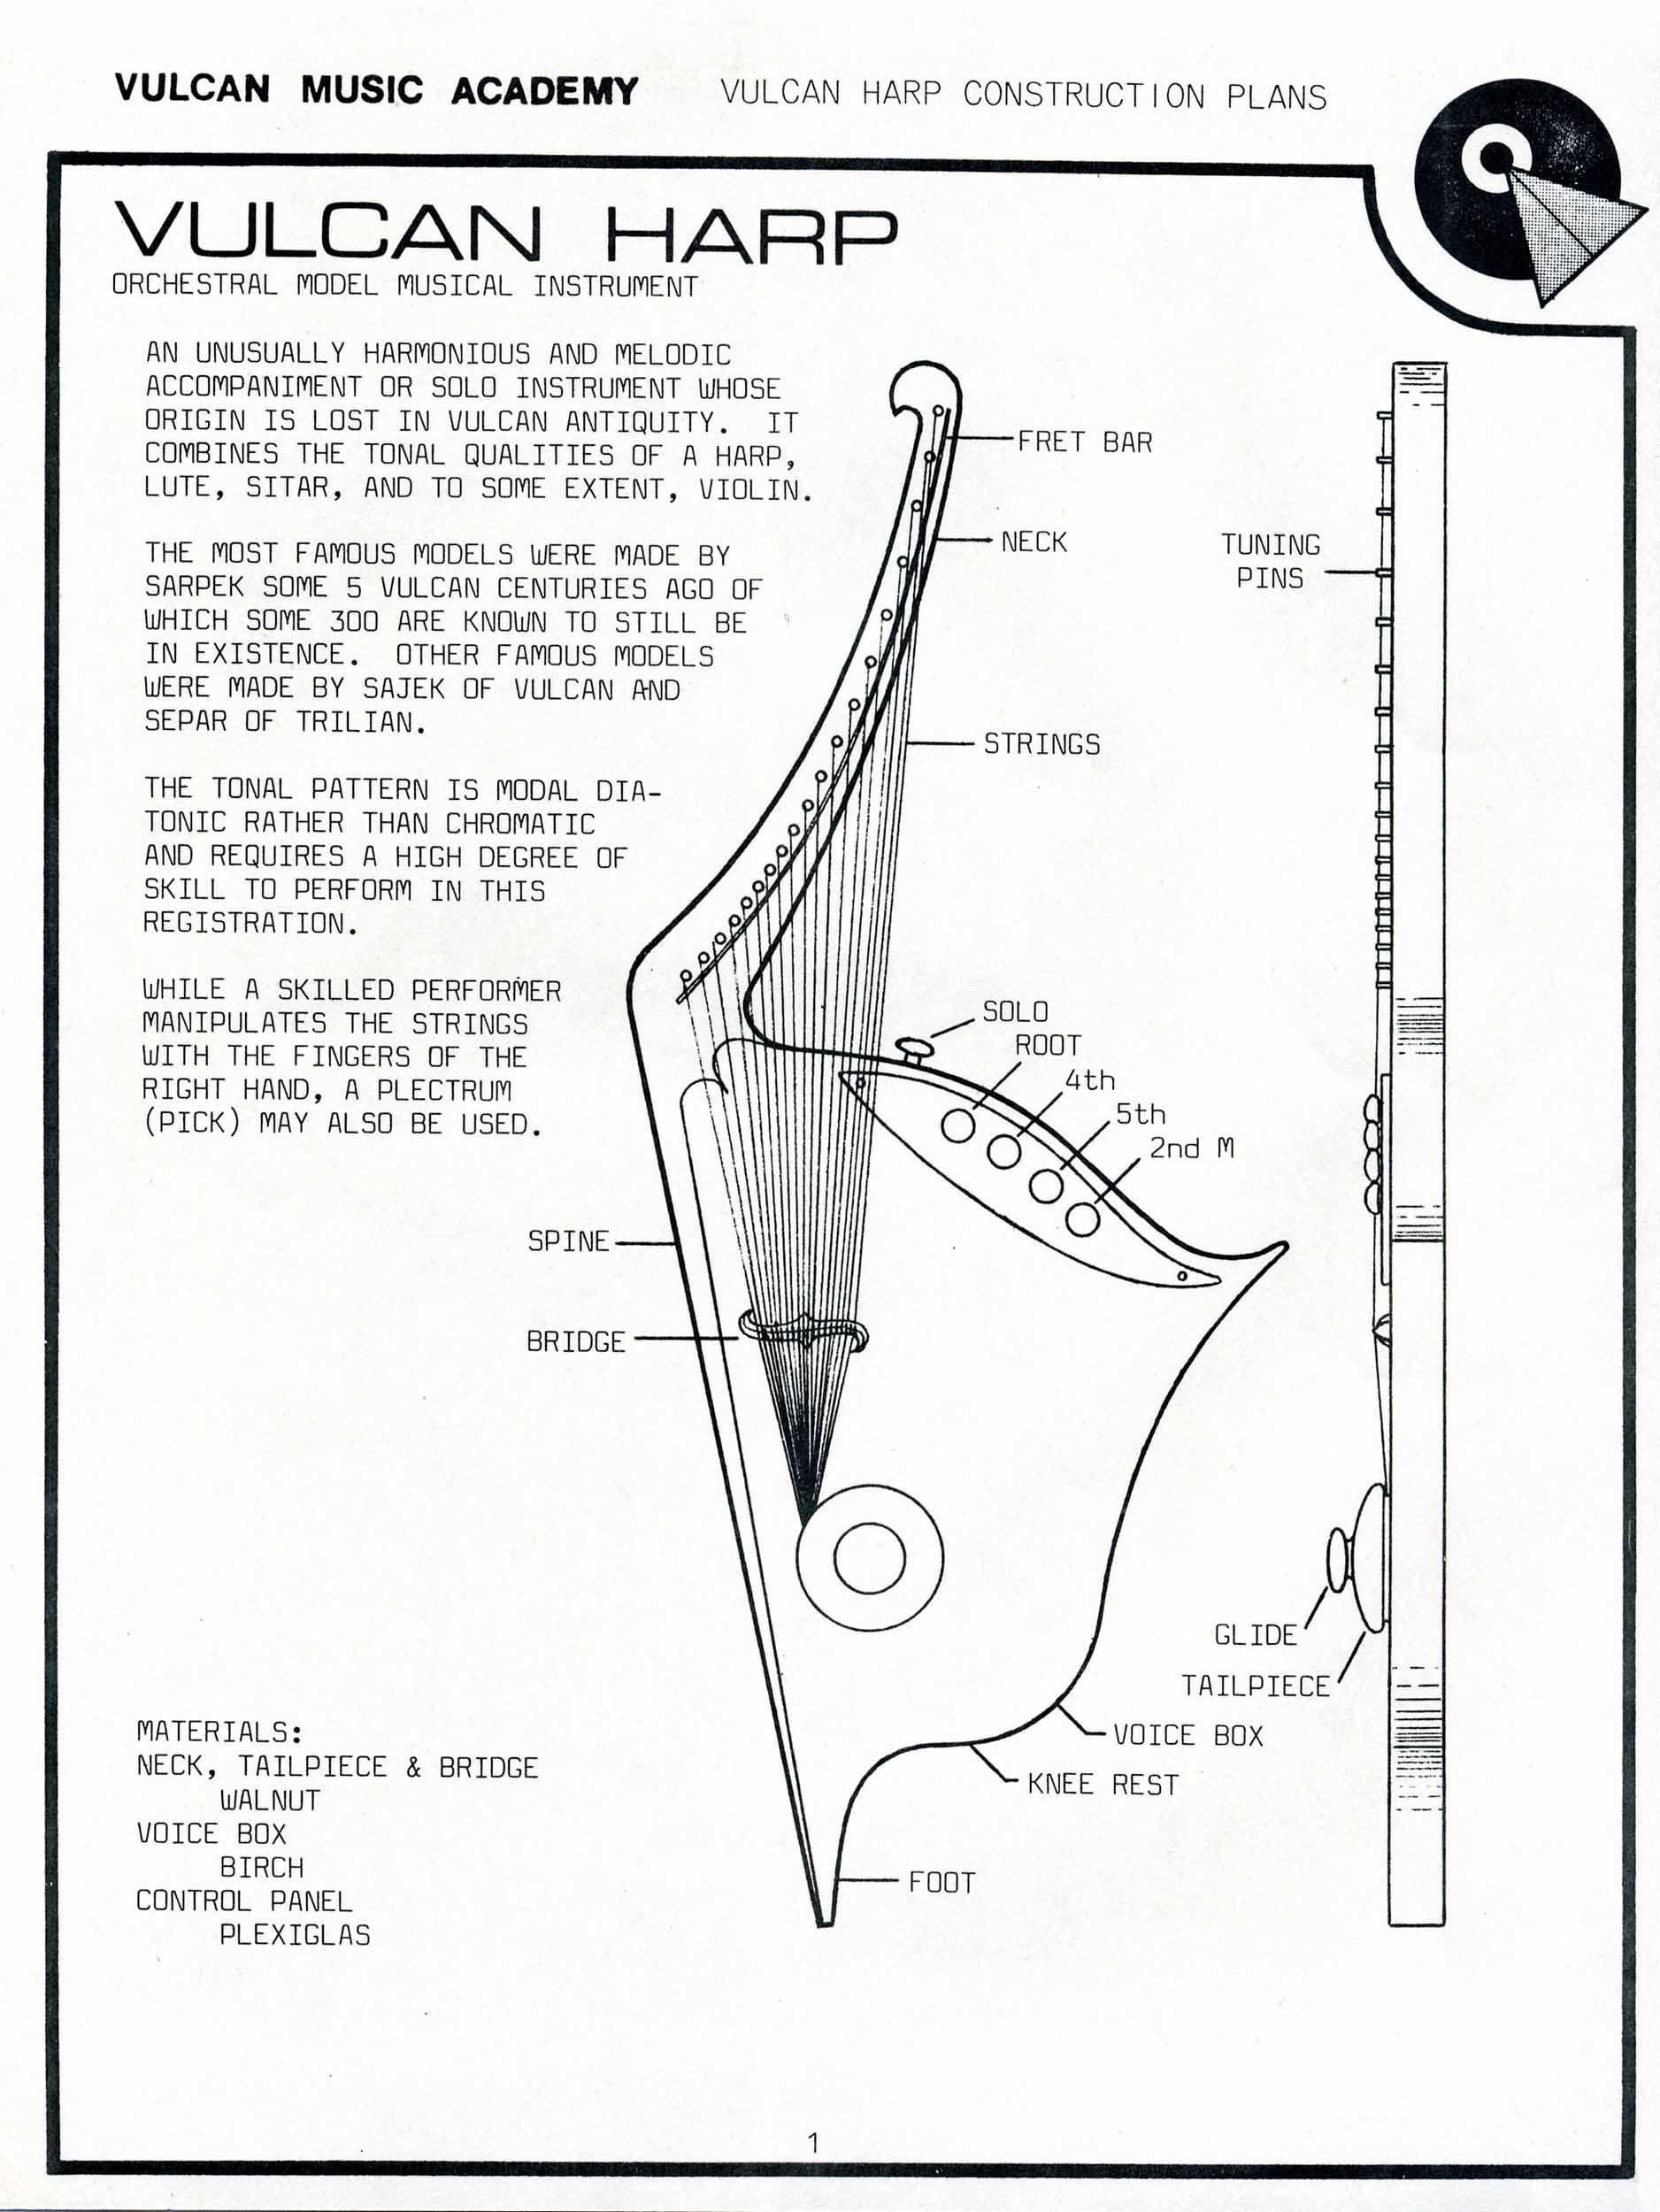 Star Trek Blueprints Vulcan Harp Construction Plans